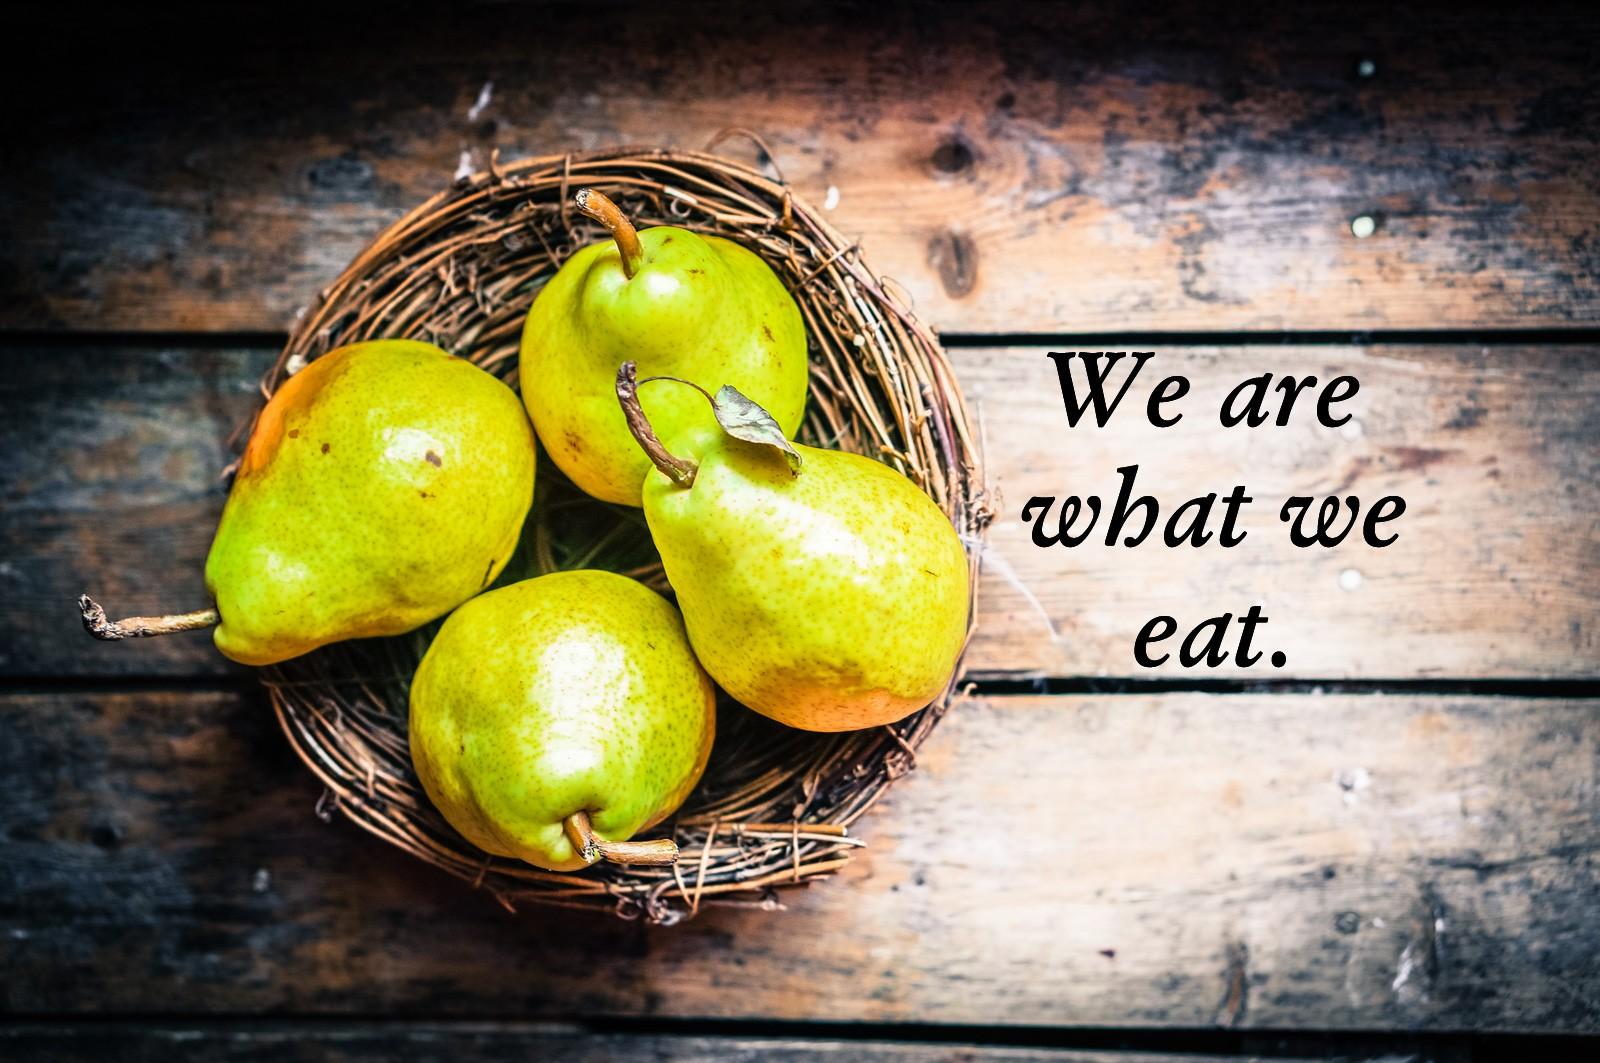 Food meanings